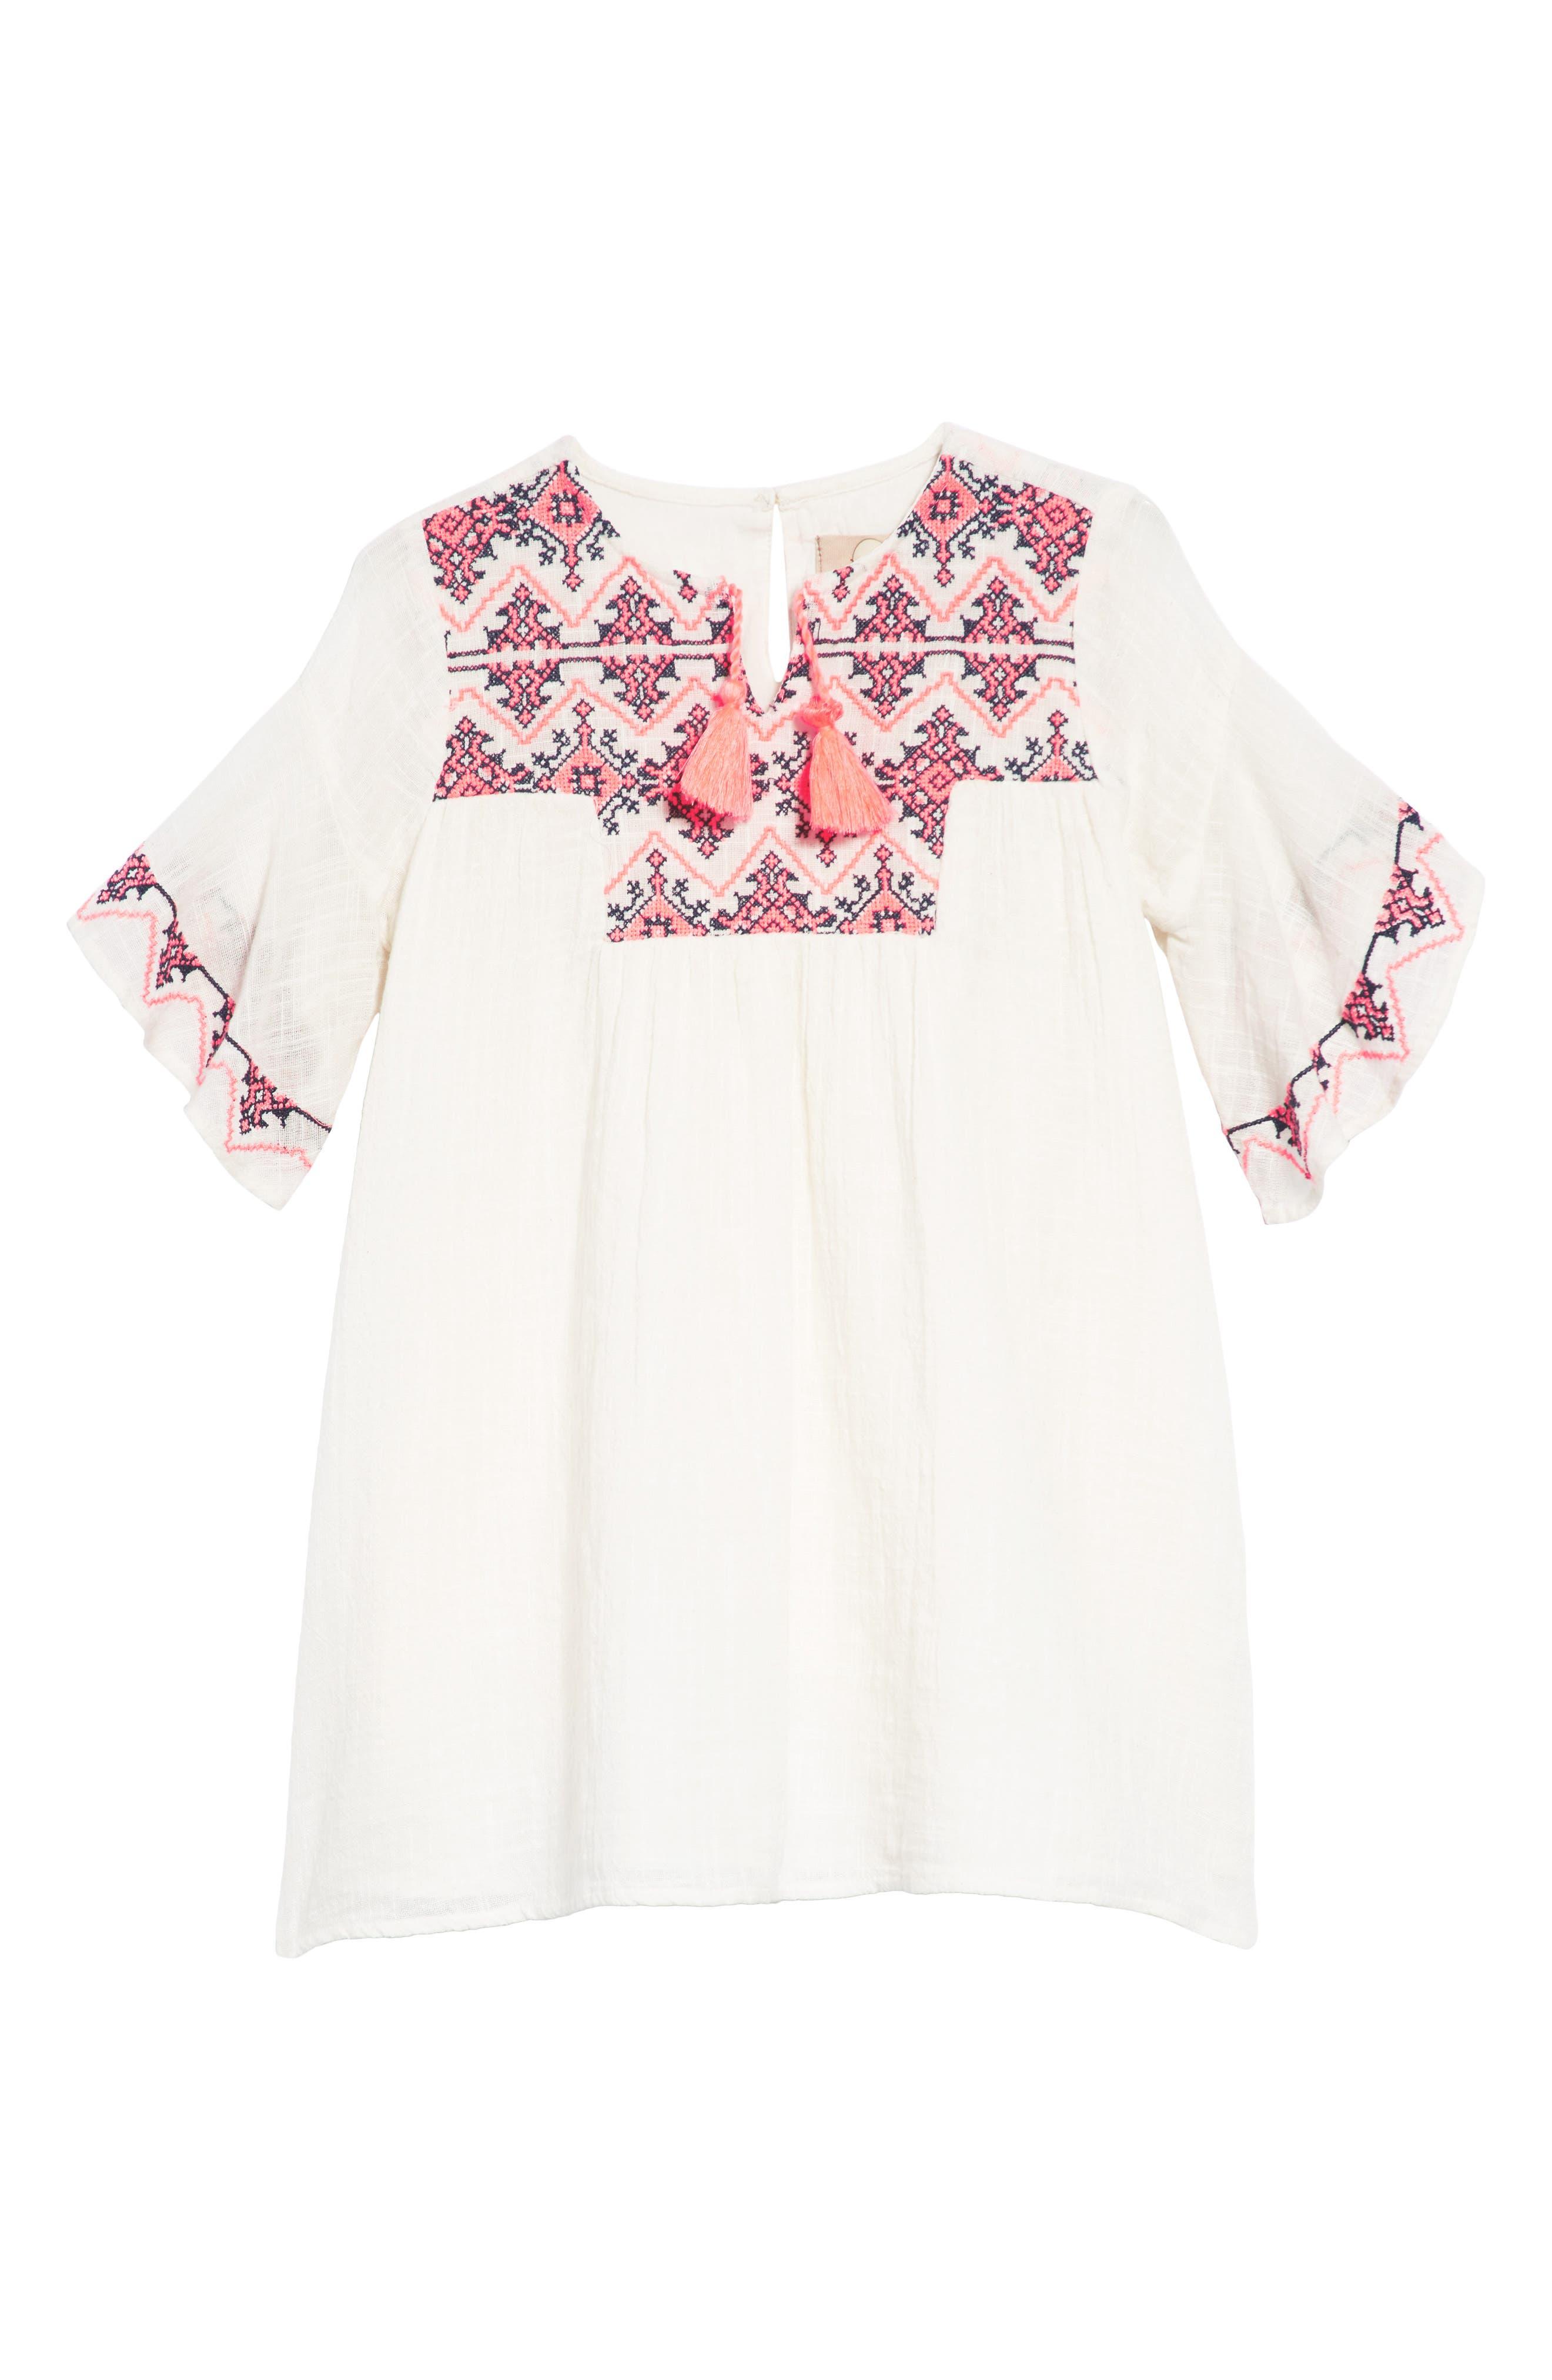 Ava Embroidered Shift Dress,                             Main thumbnail 1, color,                             100